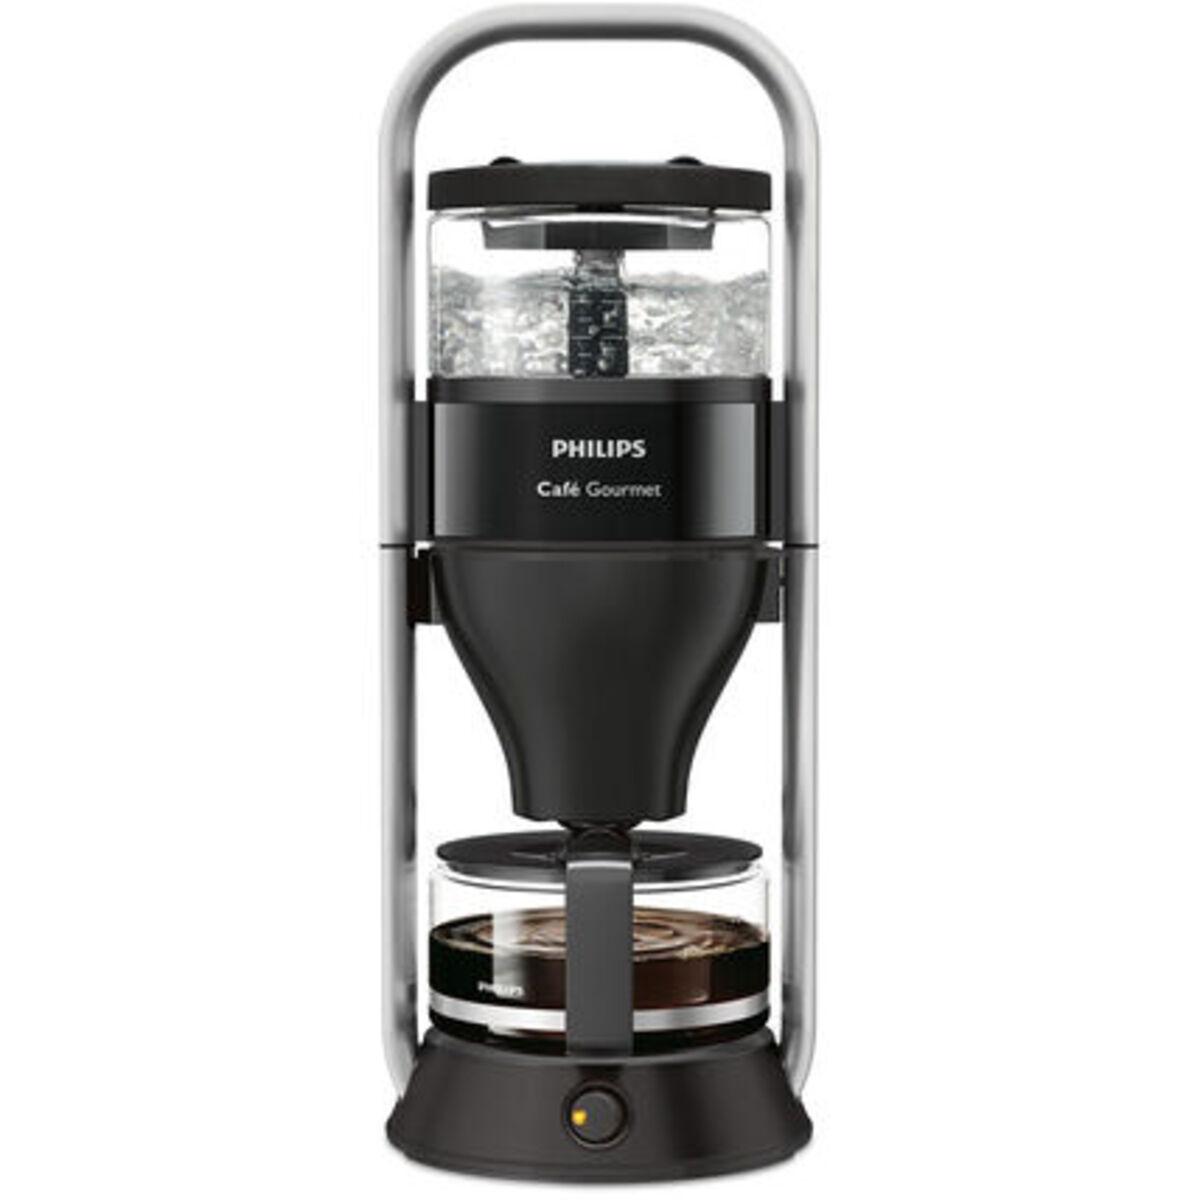 Bild 1 von Philips Kaffeeautomat Café Gourmet HD5408/60, schwarz/silber